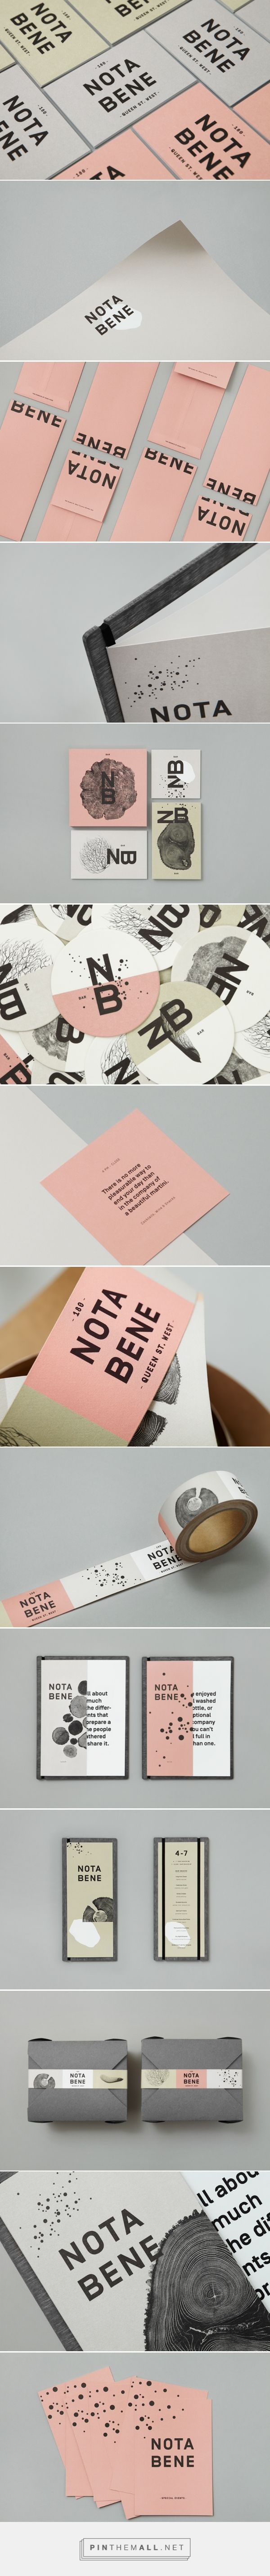 corporate identity branding minimalistic graphic design menu restaurant